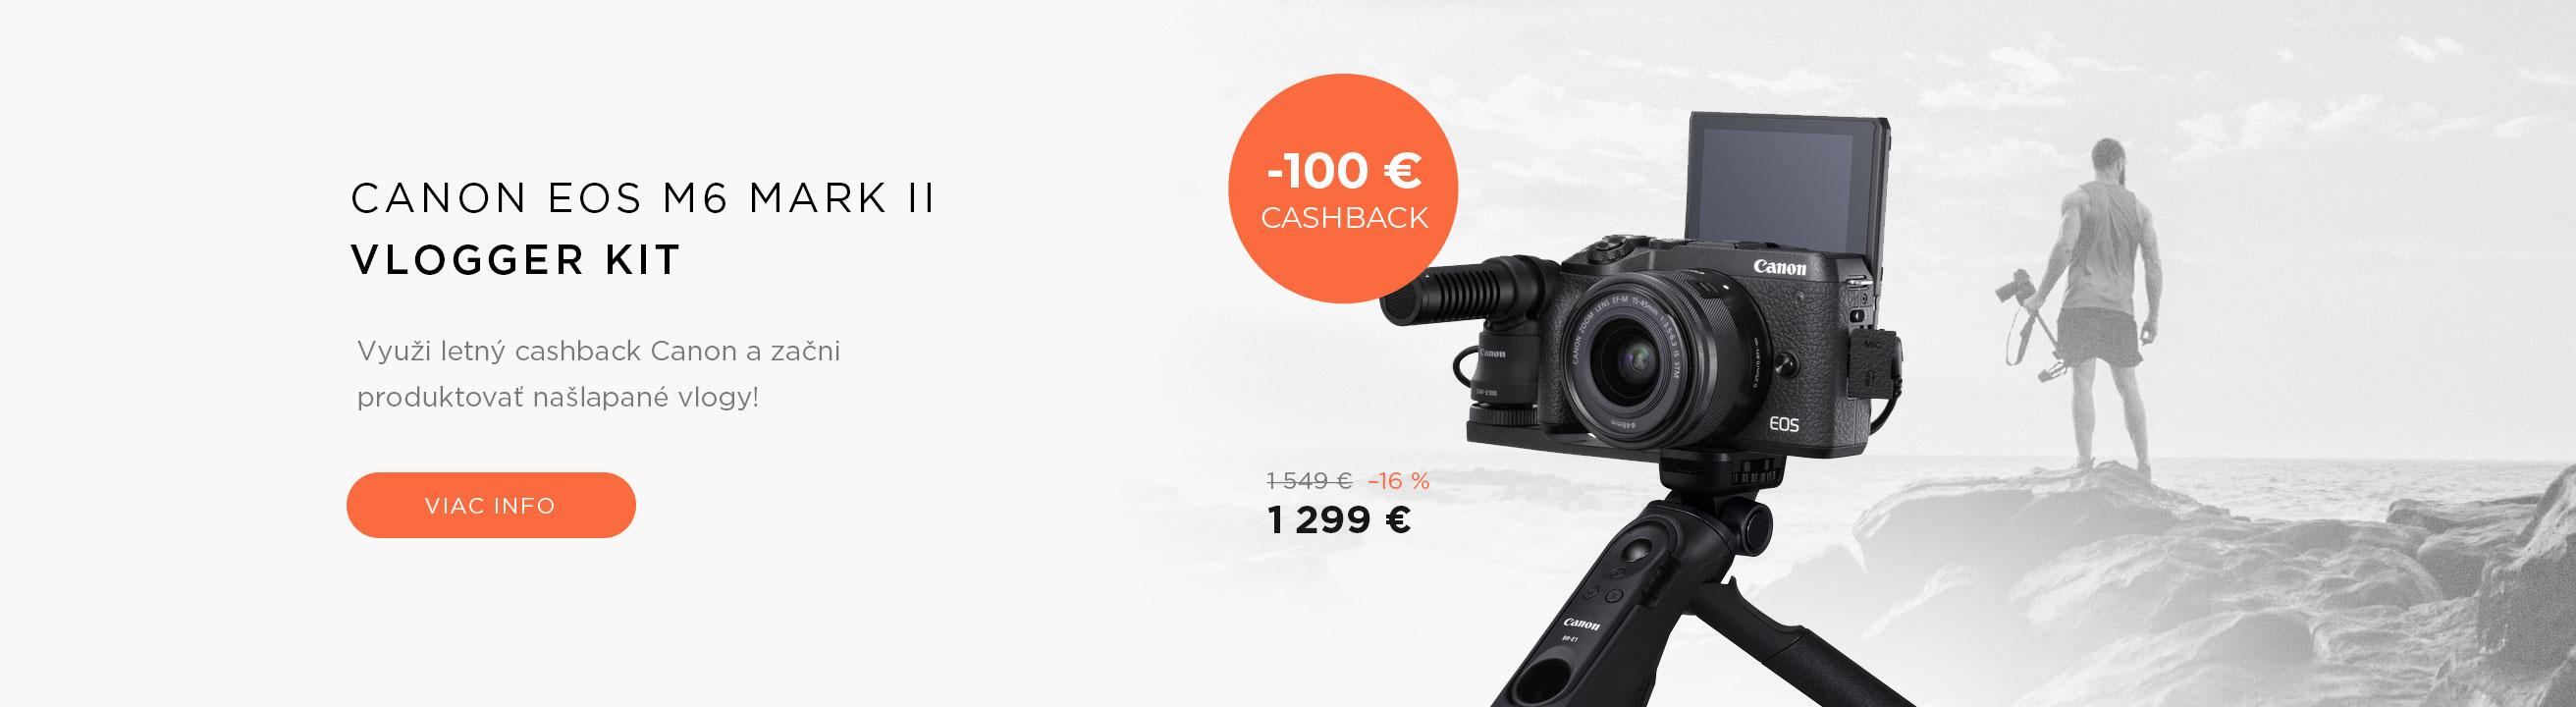 Canon EOS M6 mark II Vlogger Kit